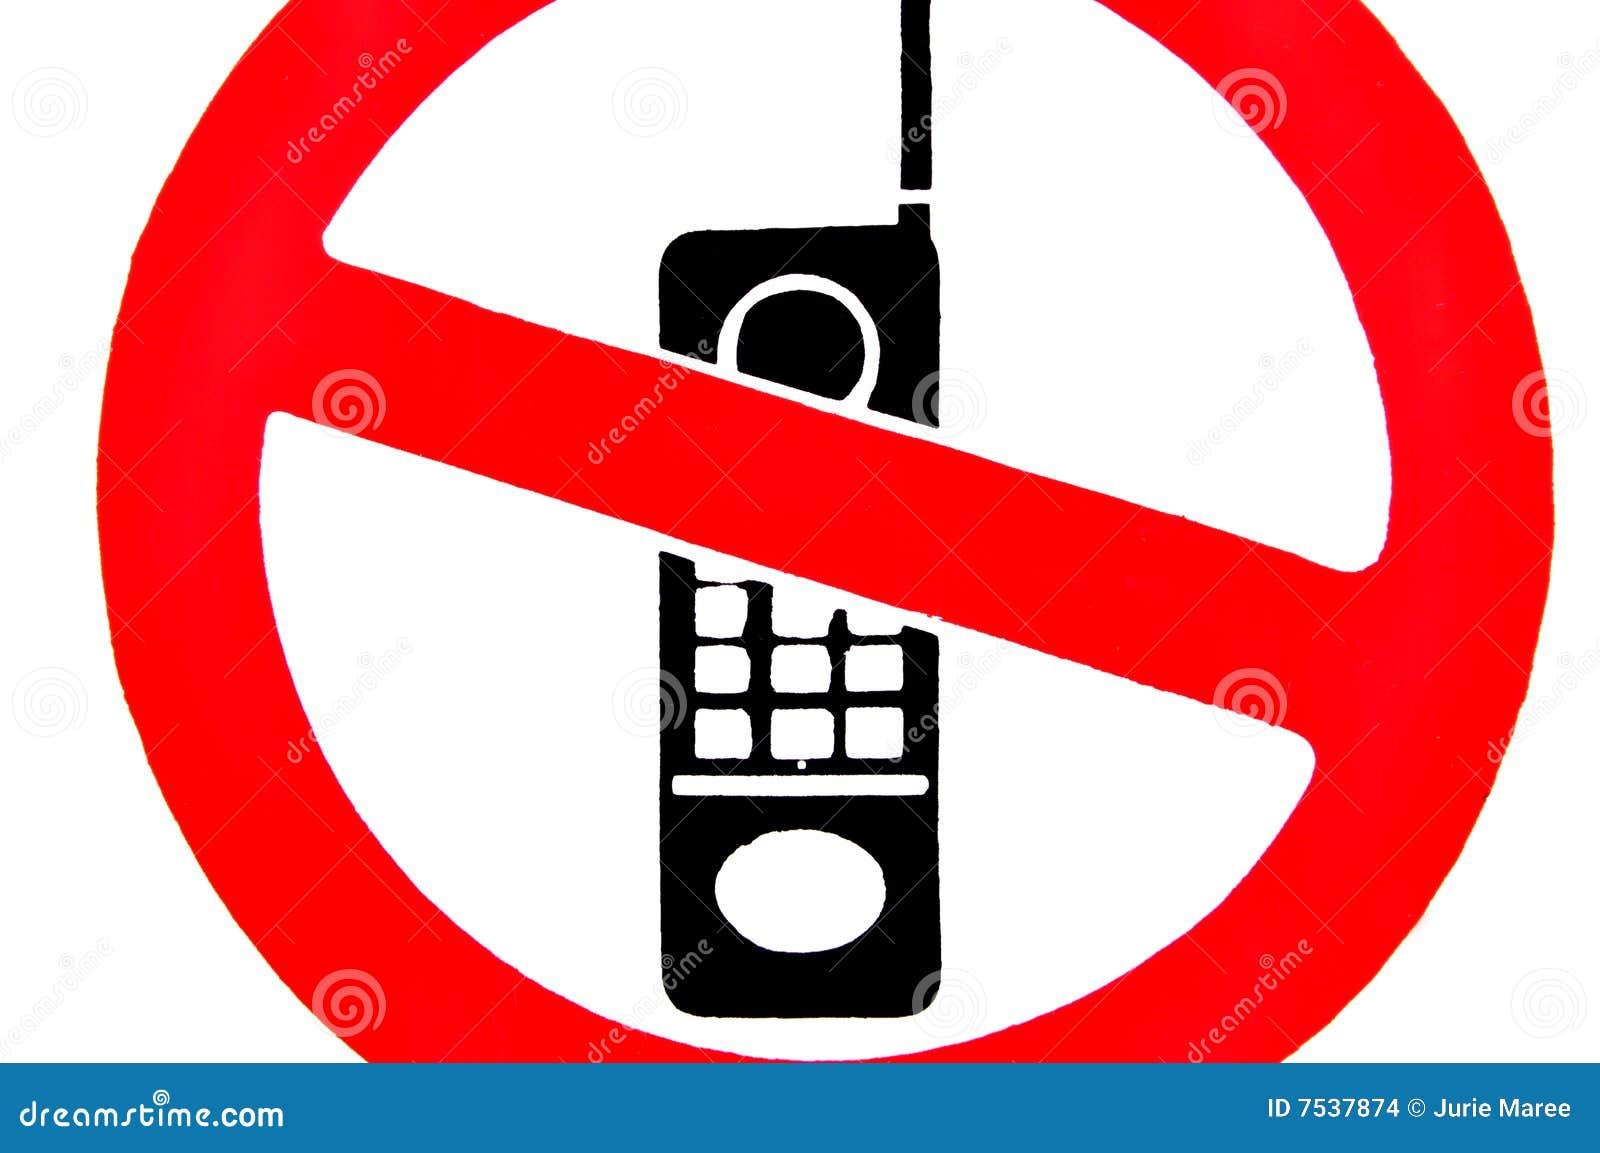 no mobile phones  stock illustration  illustration of